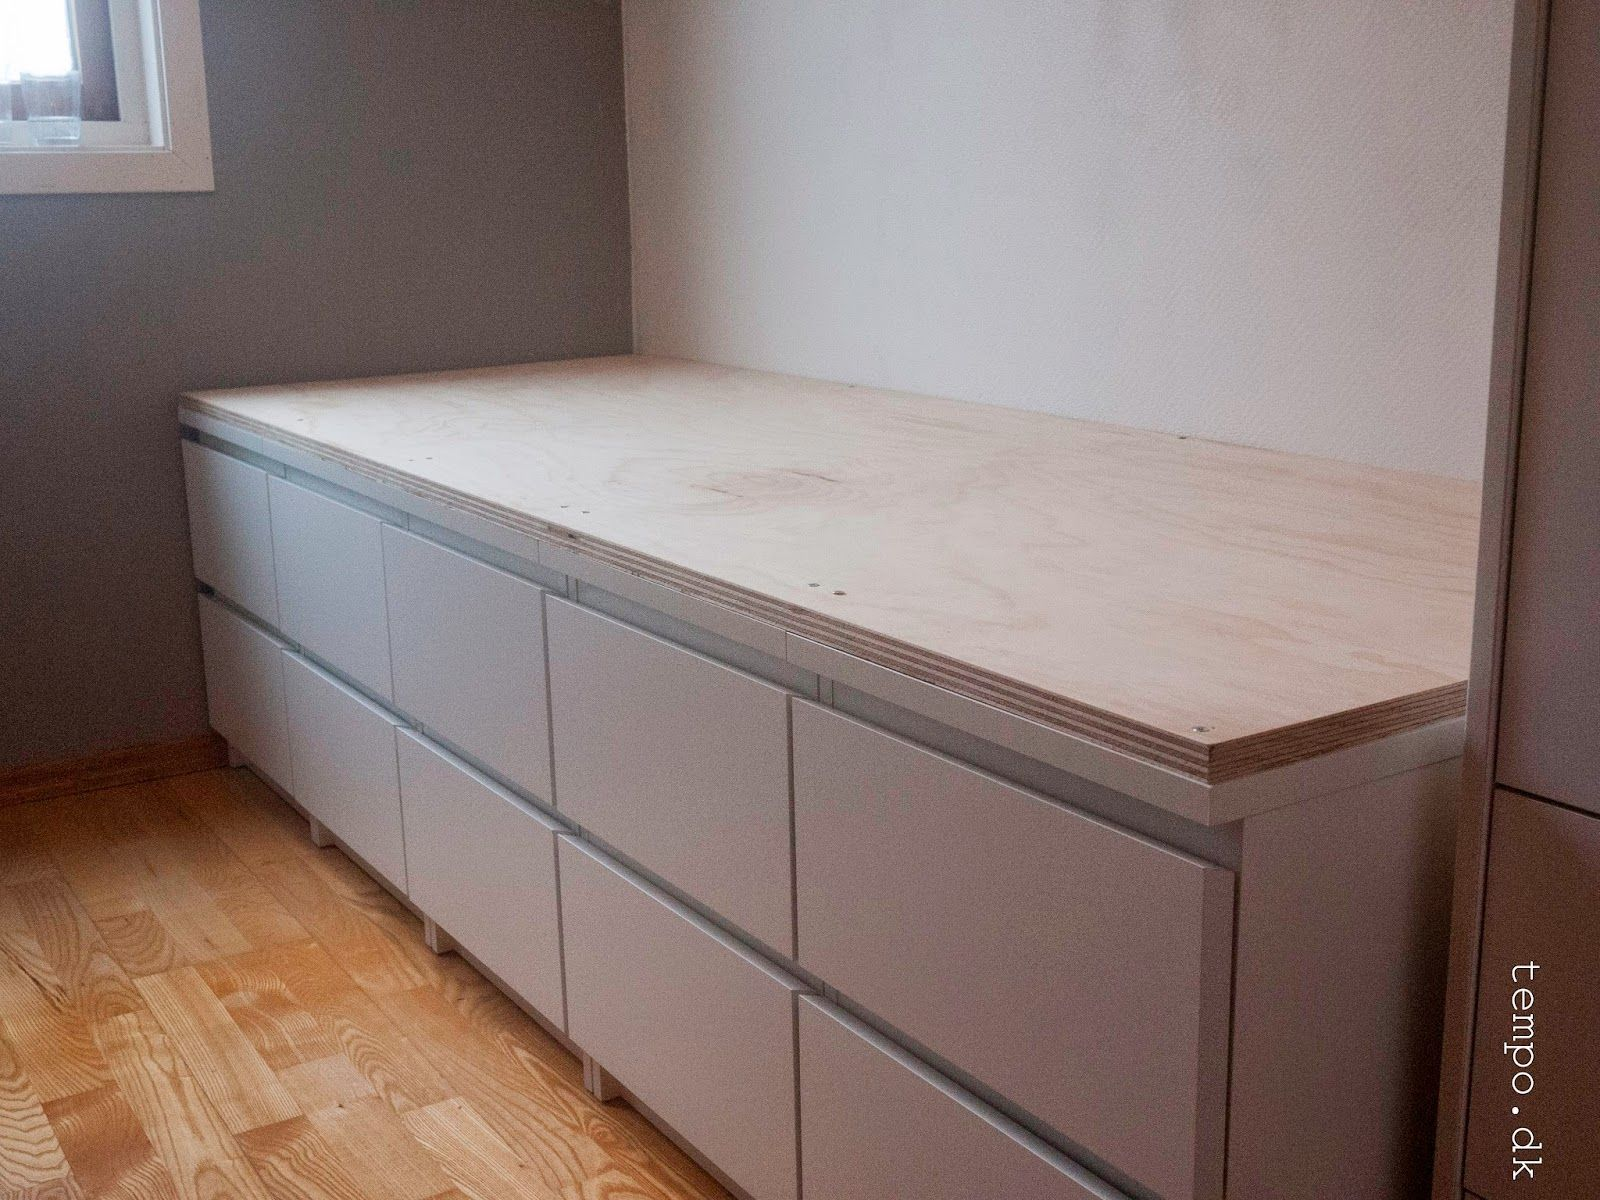 malm kommode bed google s gning diy bett kommode. Black Bedroom Furniture Sets. Home Design Ideas